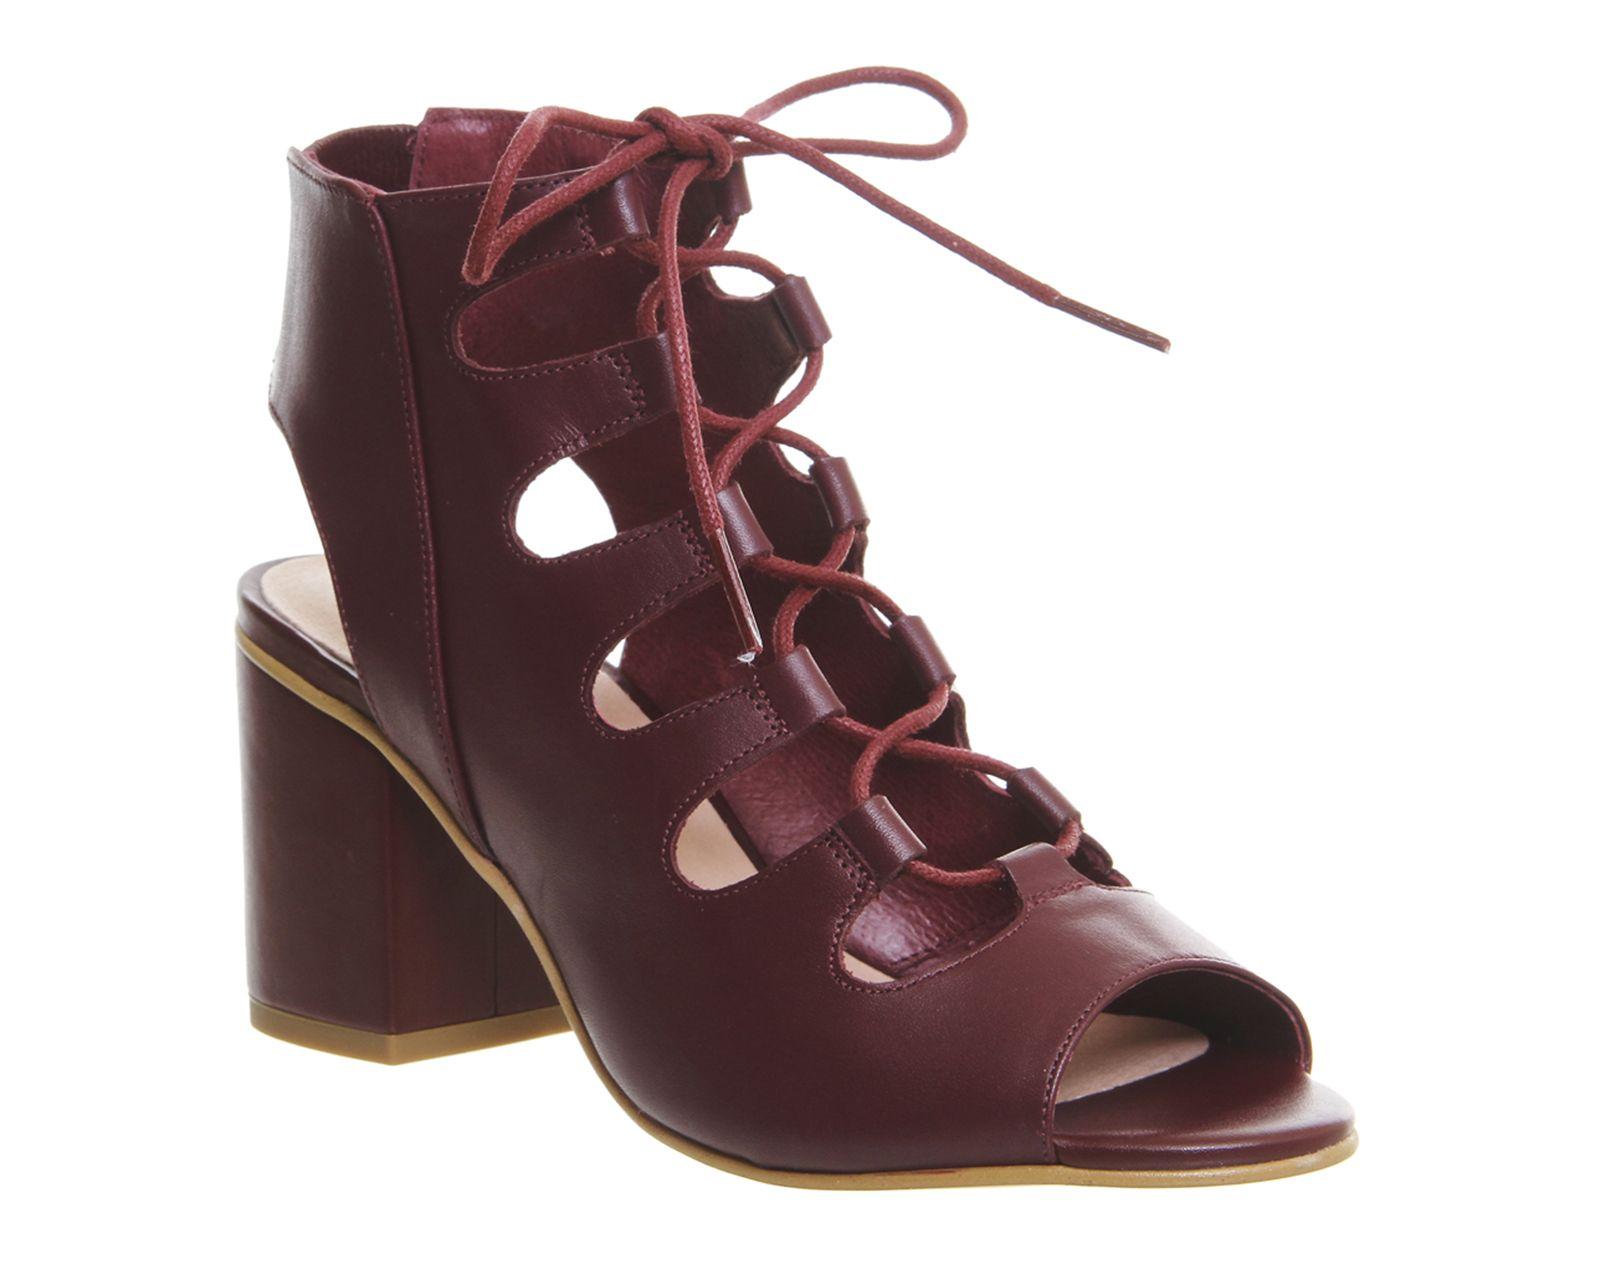 Waffle Lace Up Block Heels | Lace up block heel, Heels